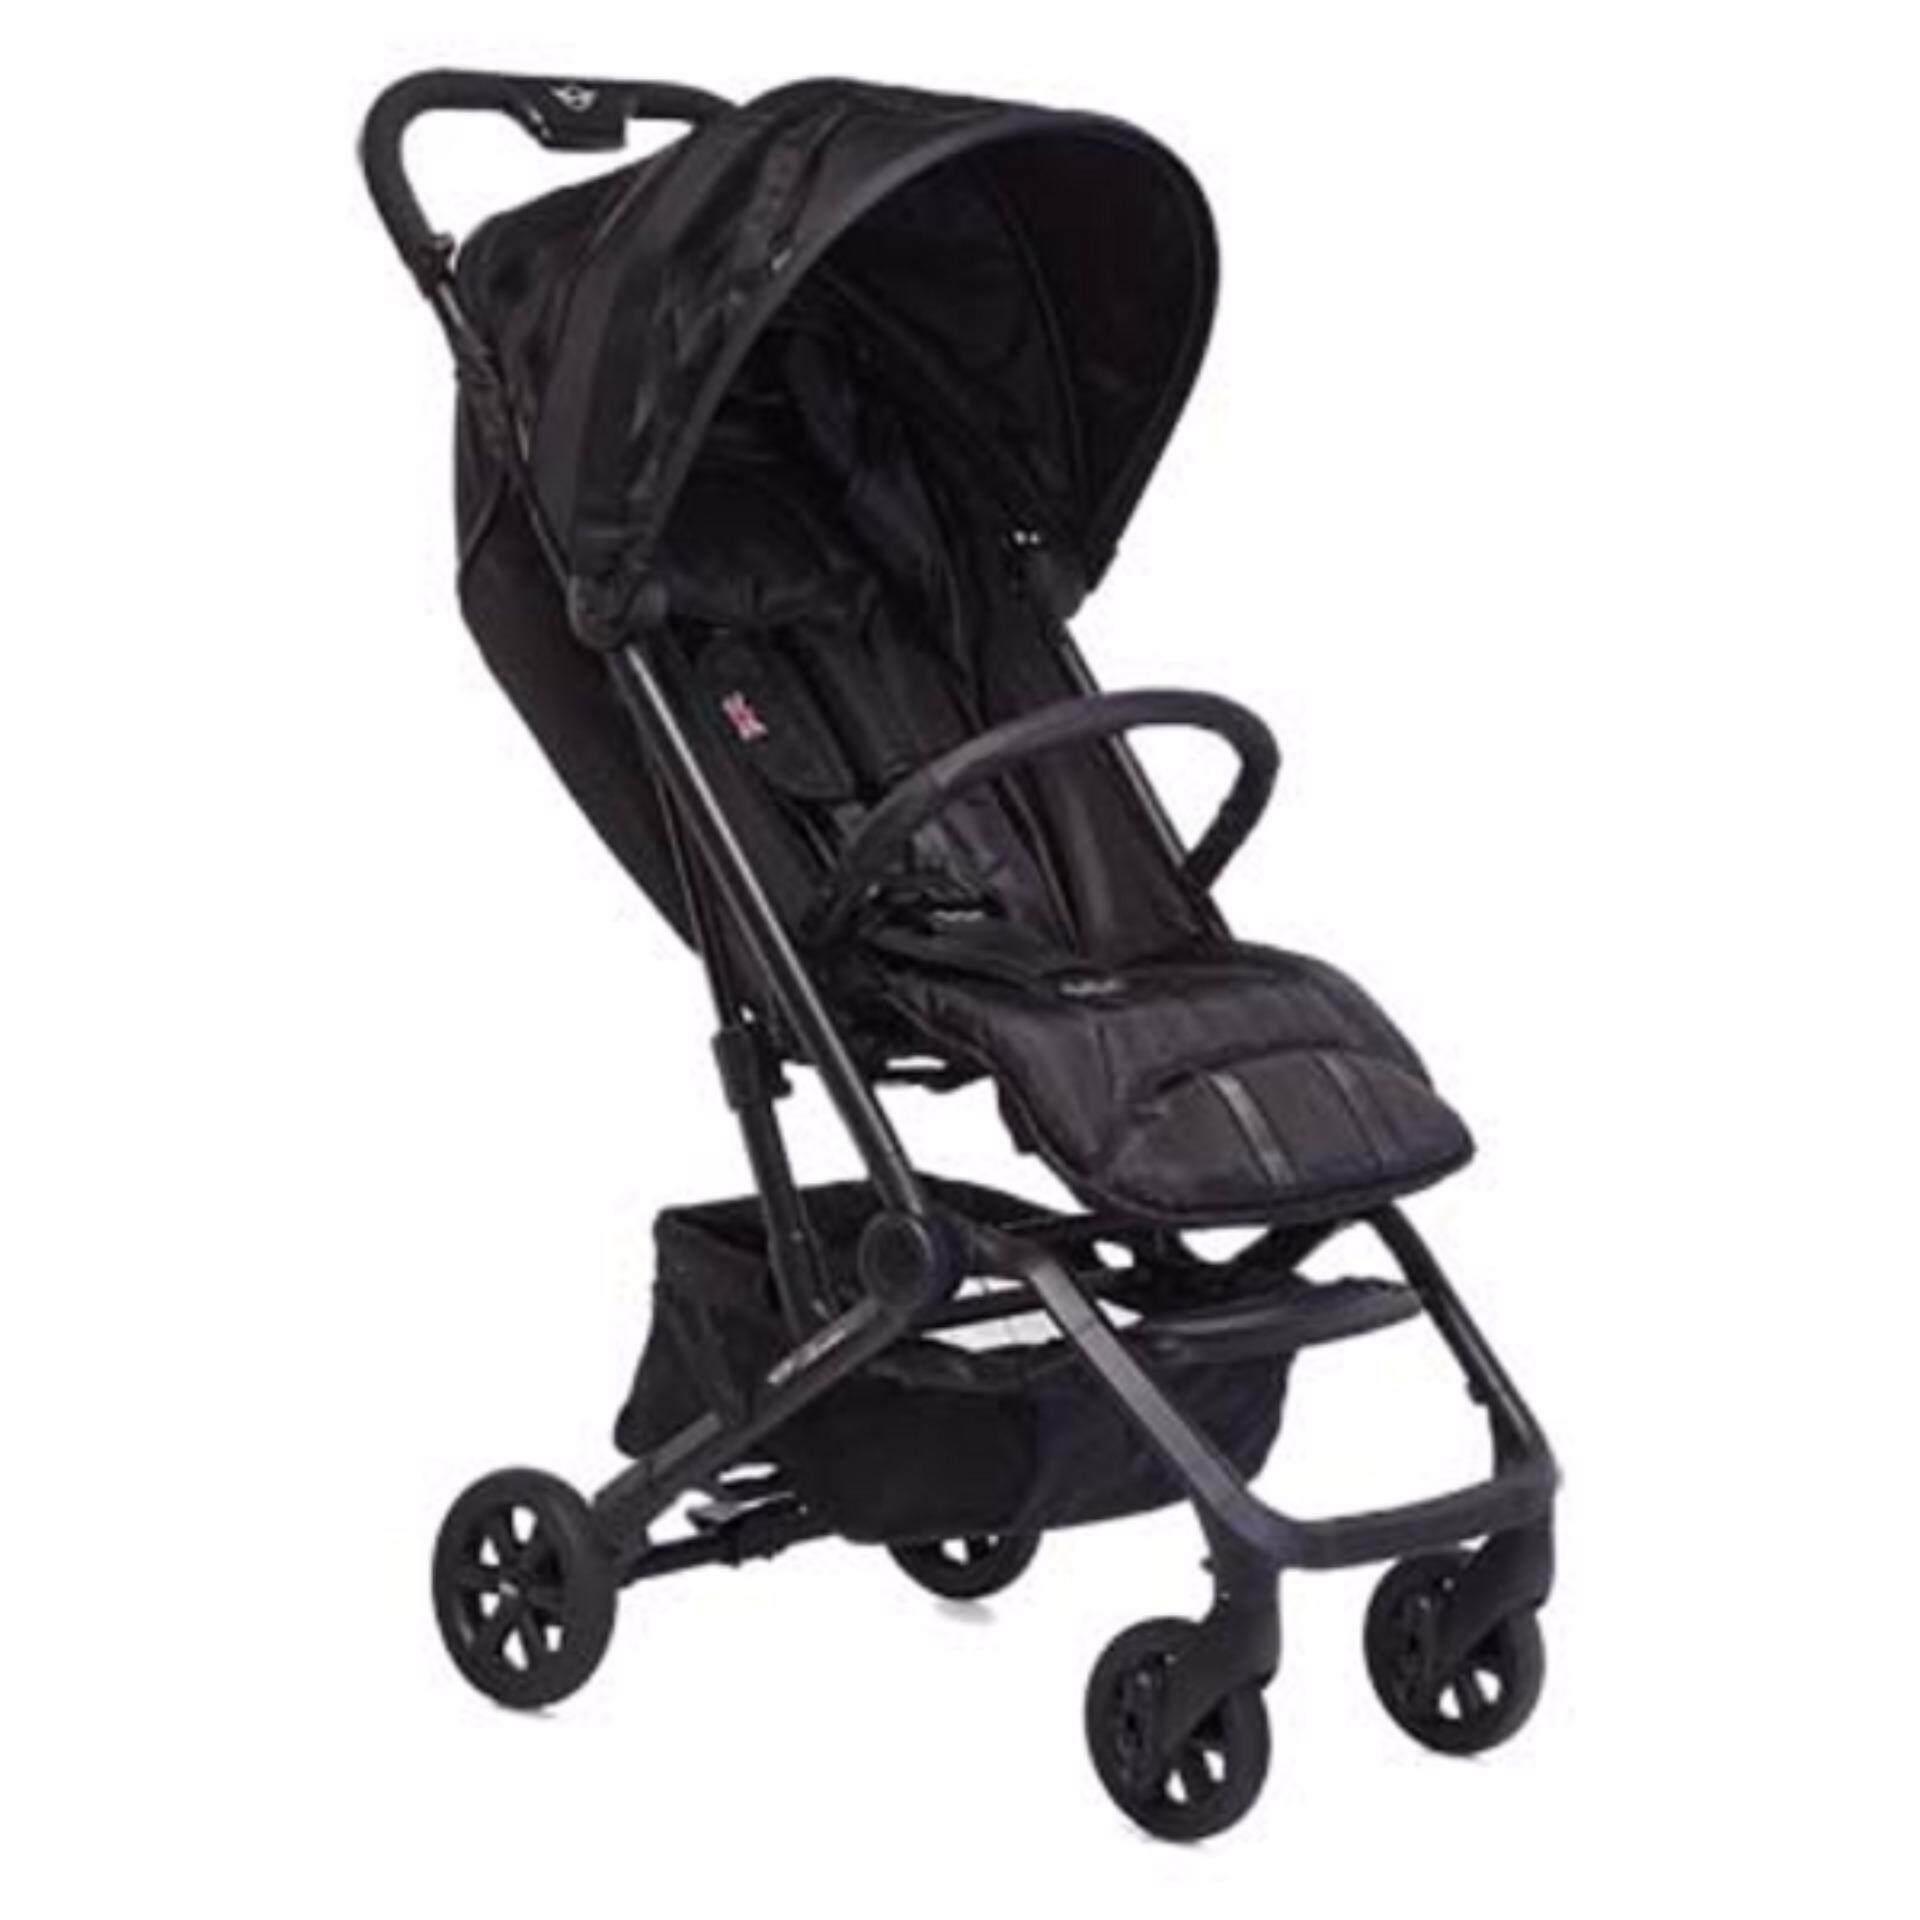 EasyWalker MINI XS Stroller (Luxury Black)